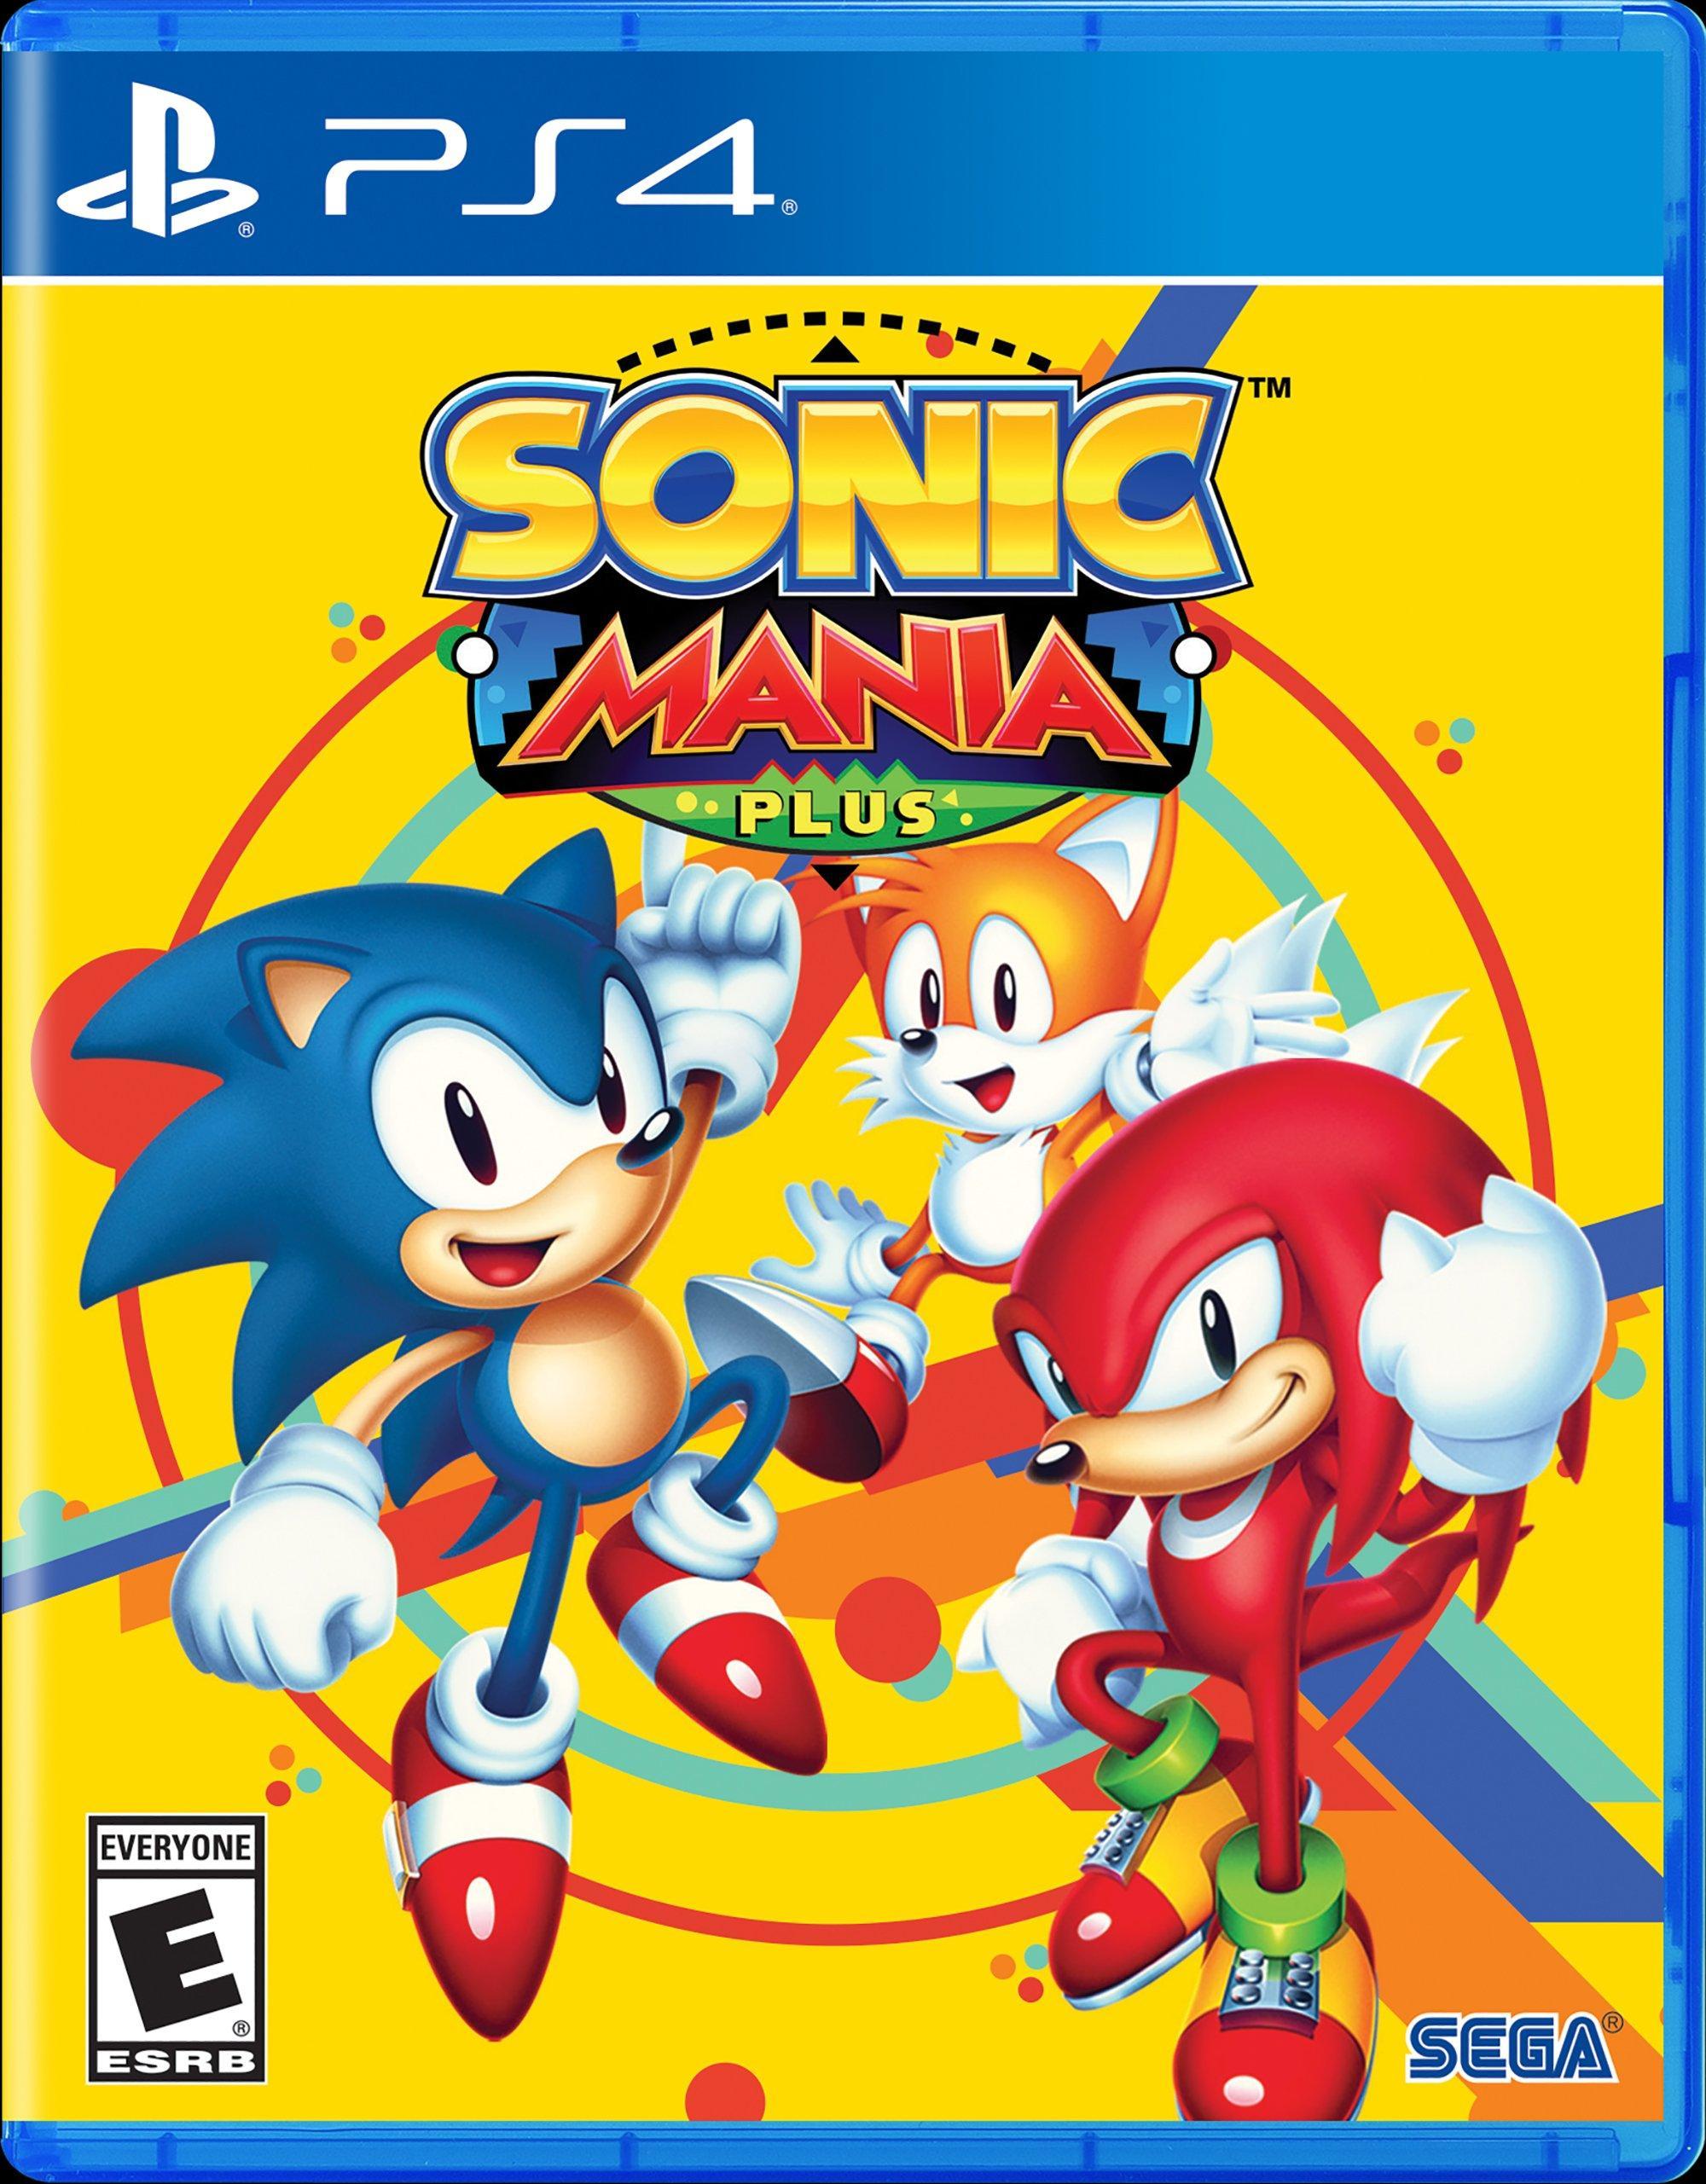 Sonic Mania Plus | PlayStation 4 | GameStop